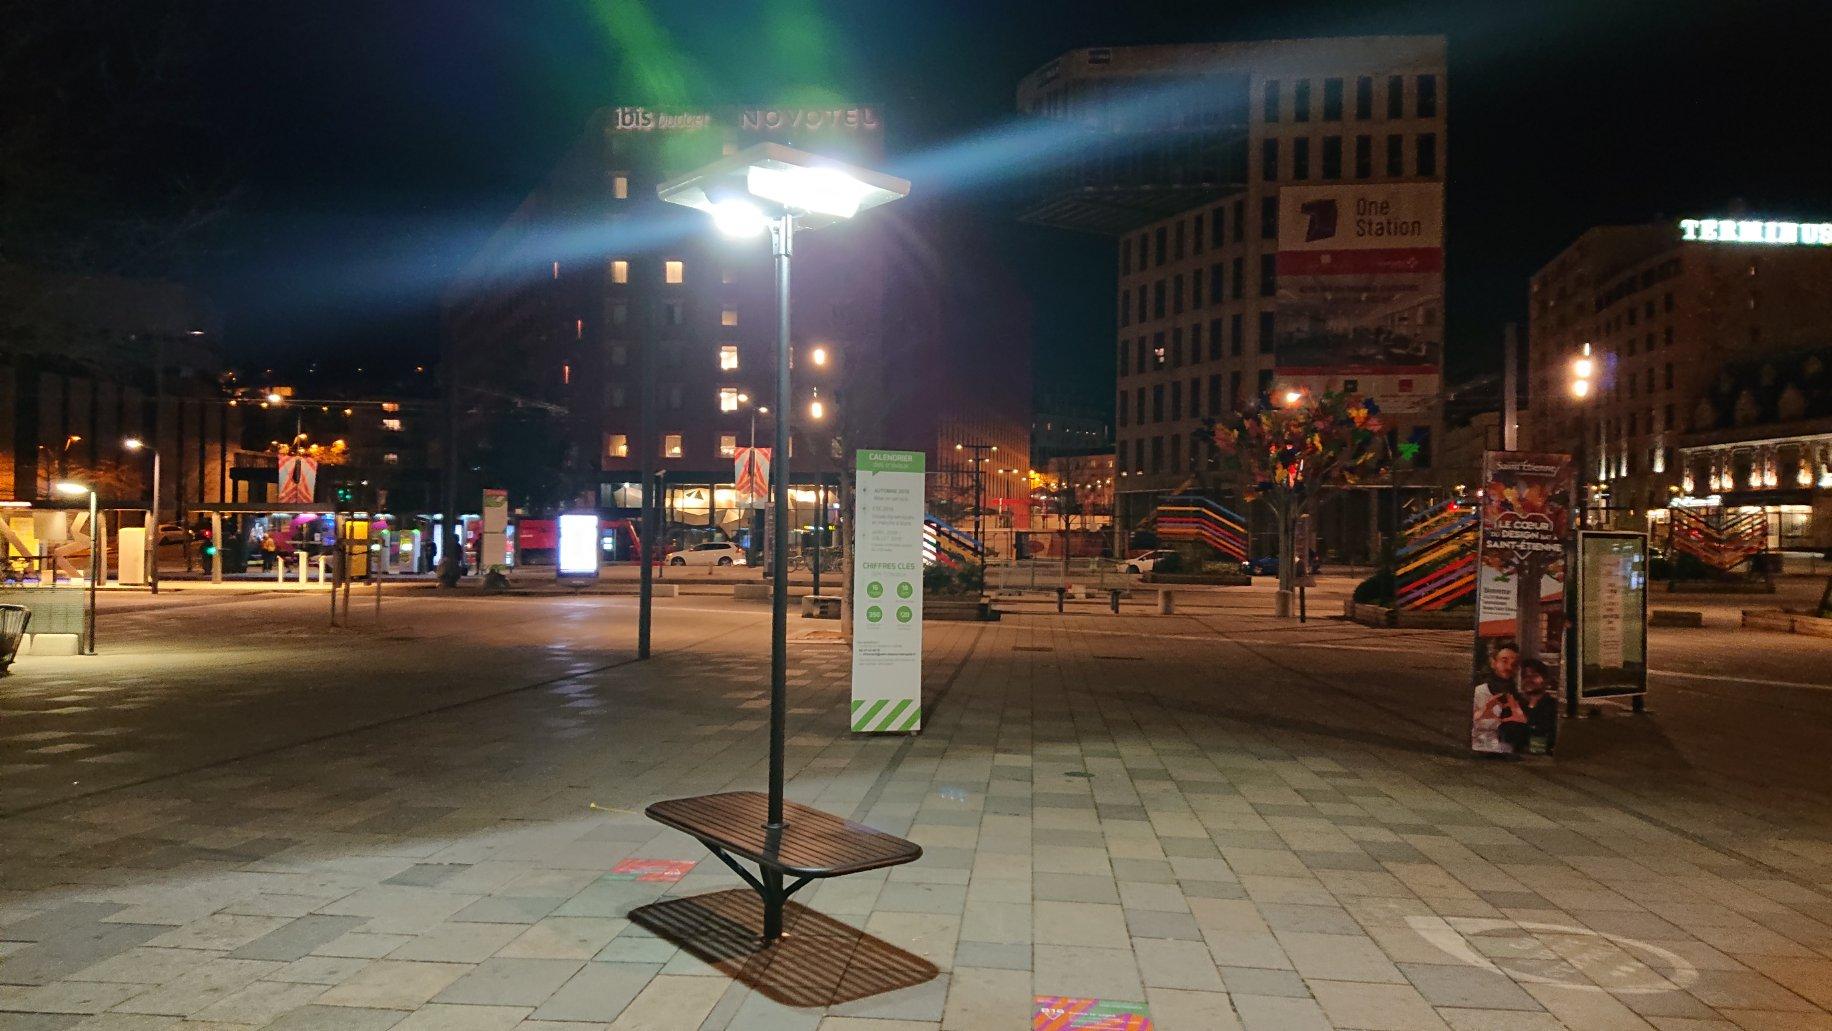 Street furniture with solar lighting at the International Design Biennale in Saint-Etienne